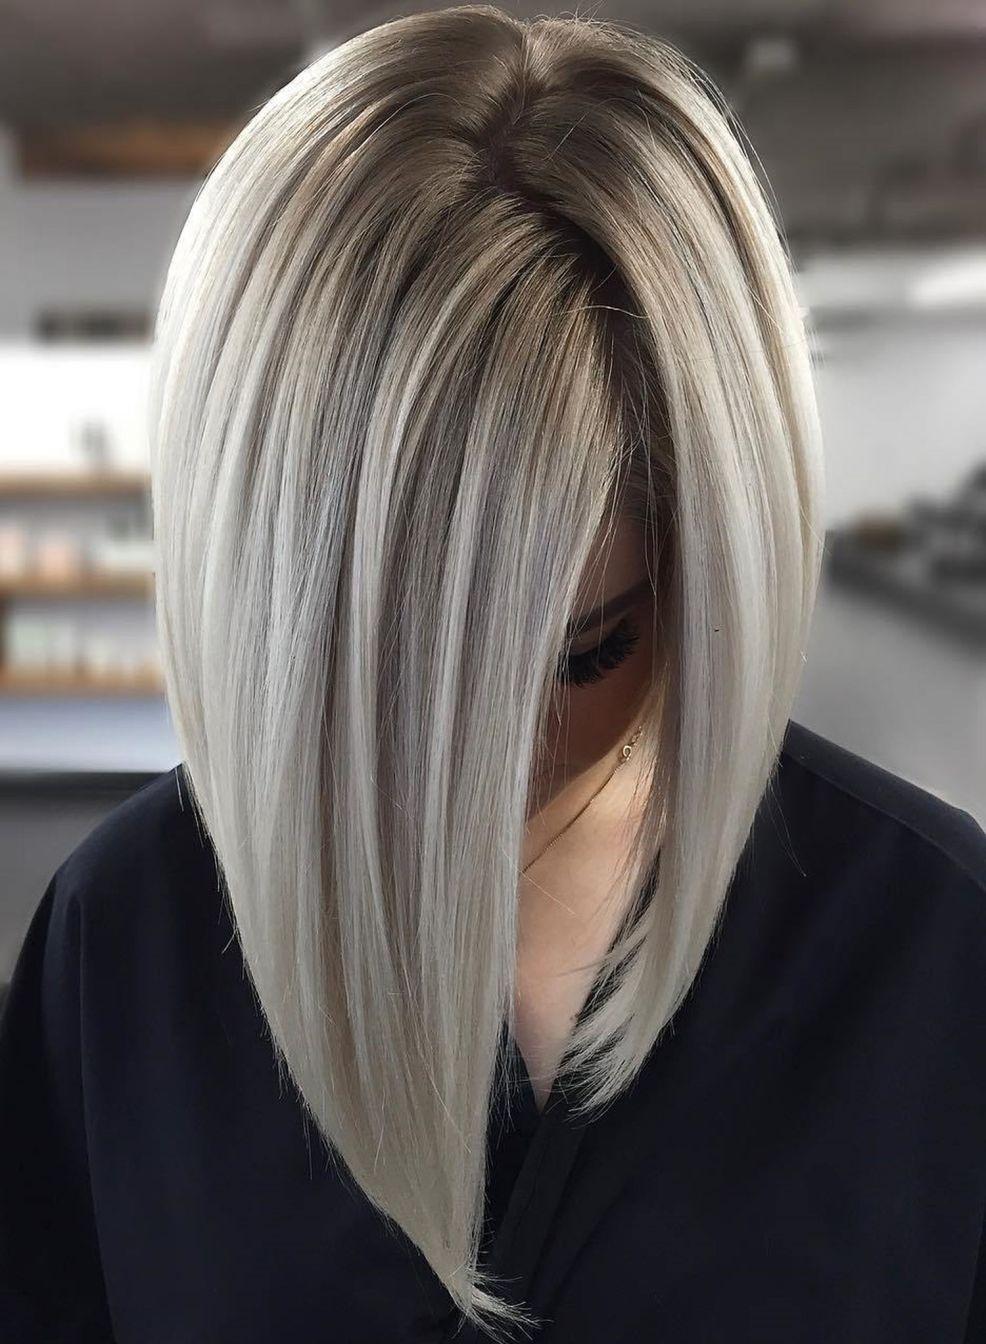 70 Perfect Medium Length Hairstyles For Thin Hair In 2019 Hair